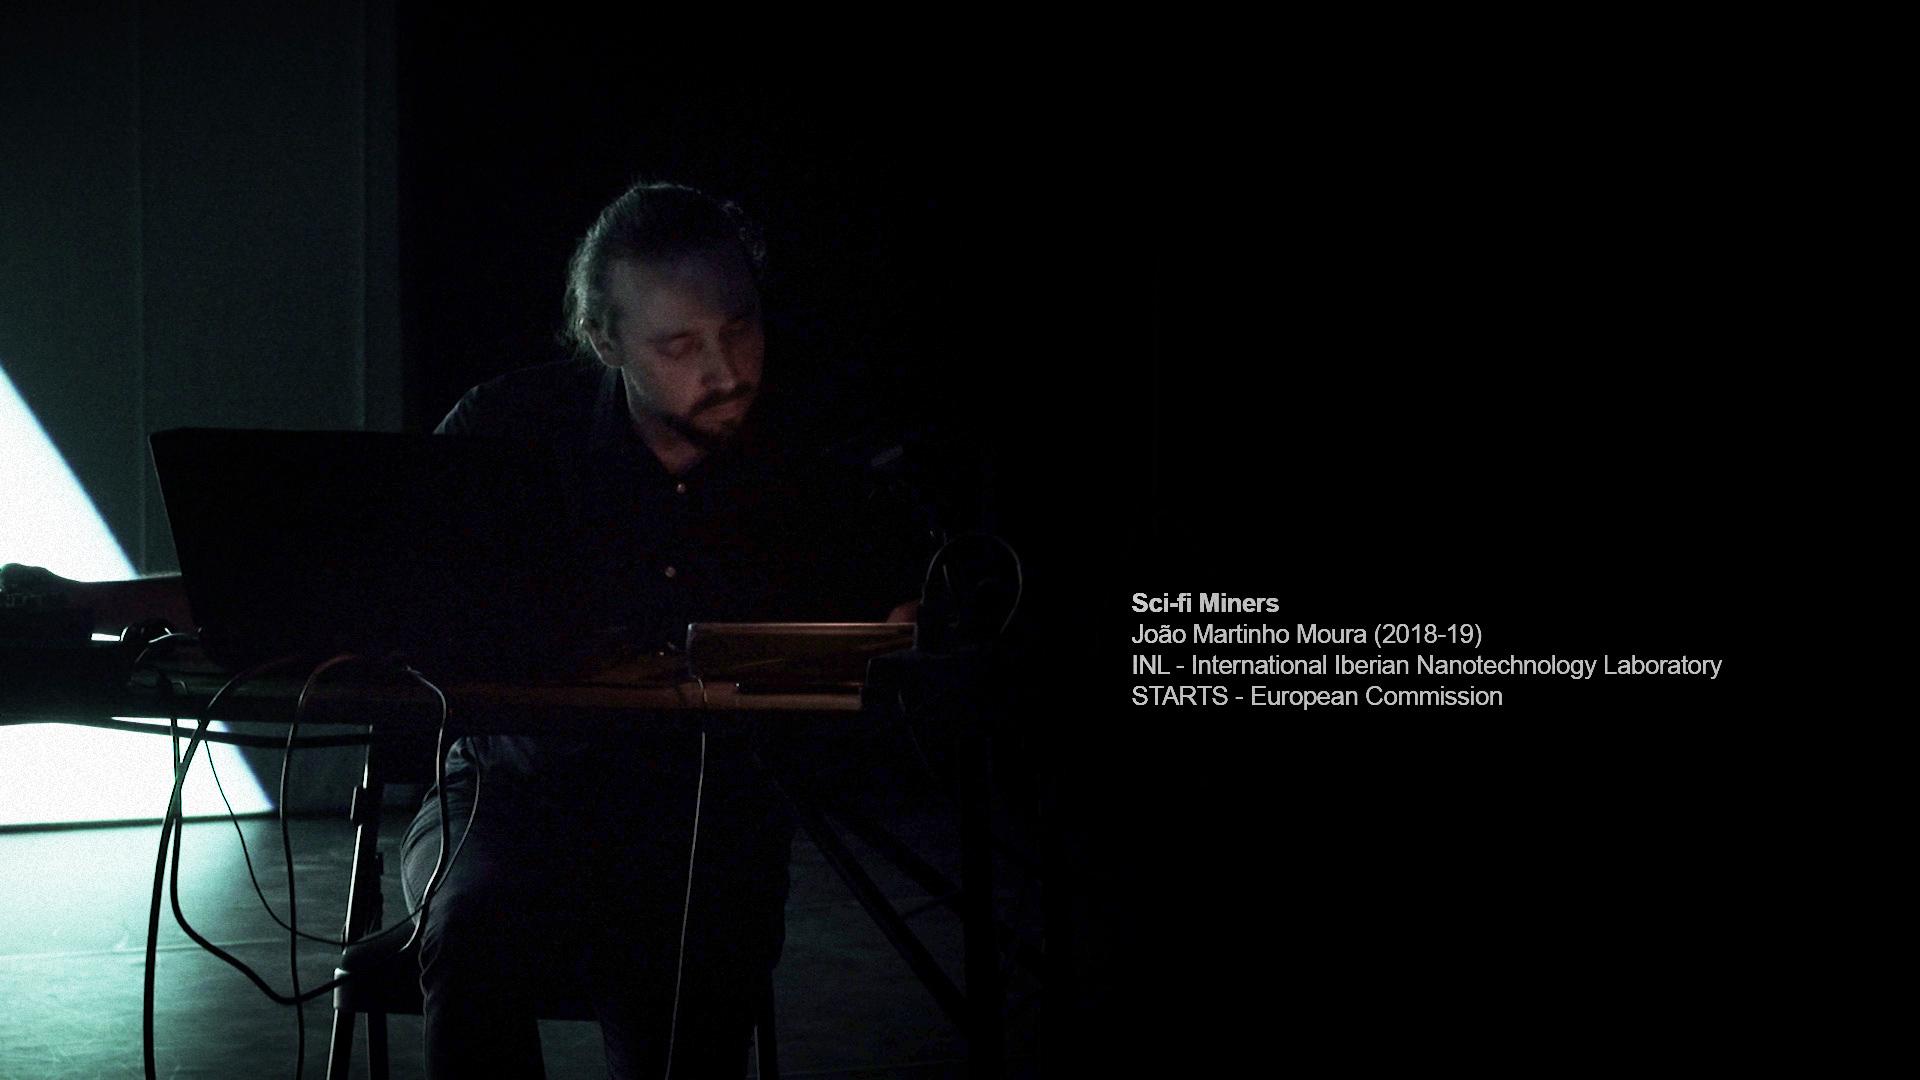 Performance in Virtual Reality, João Martinho Moura